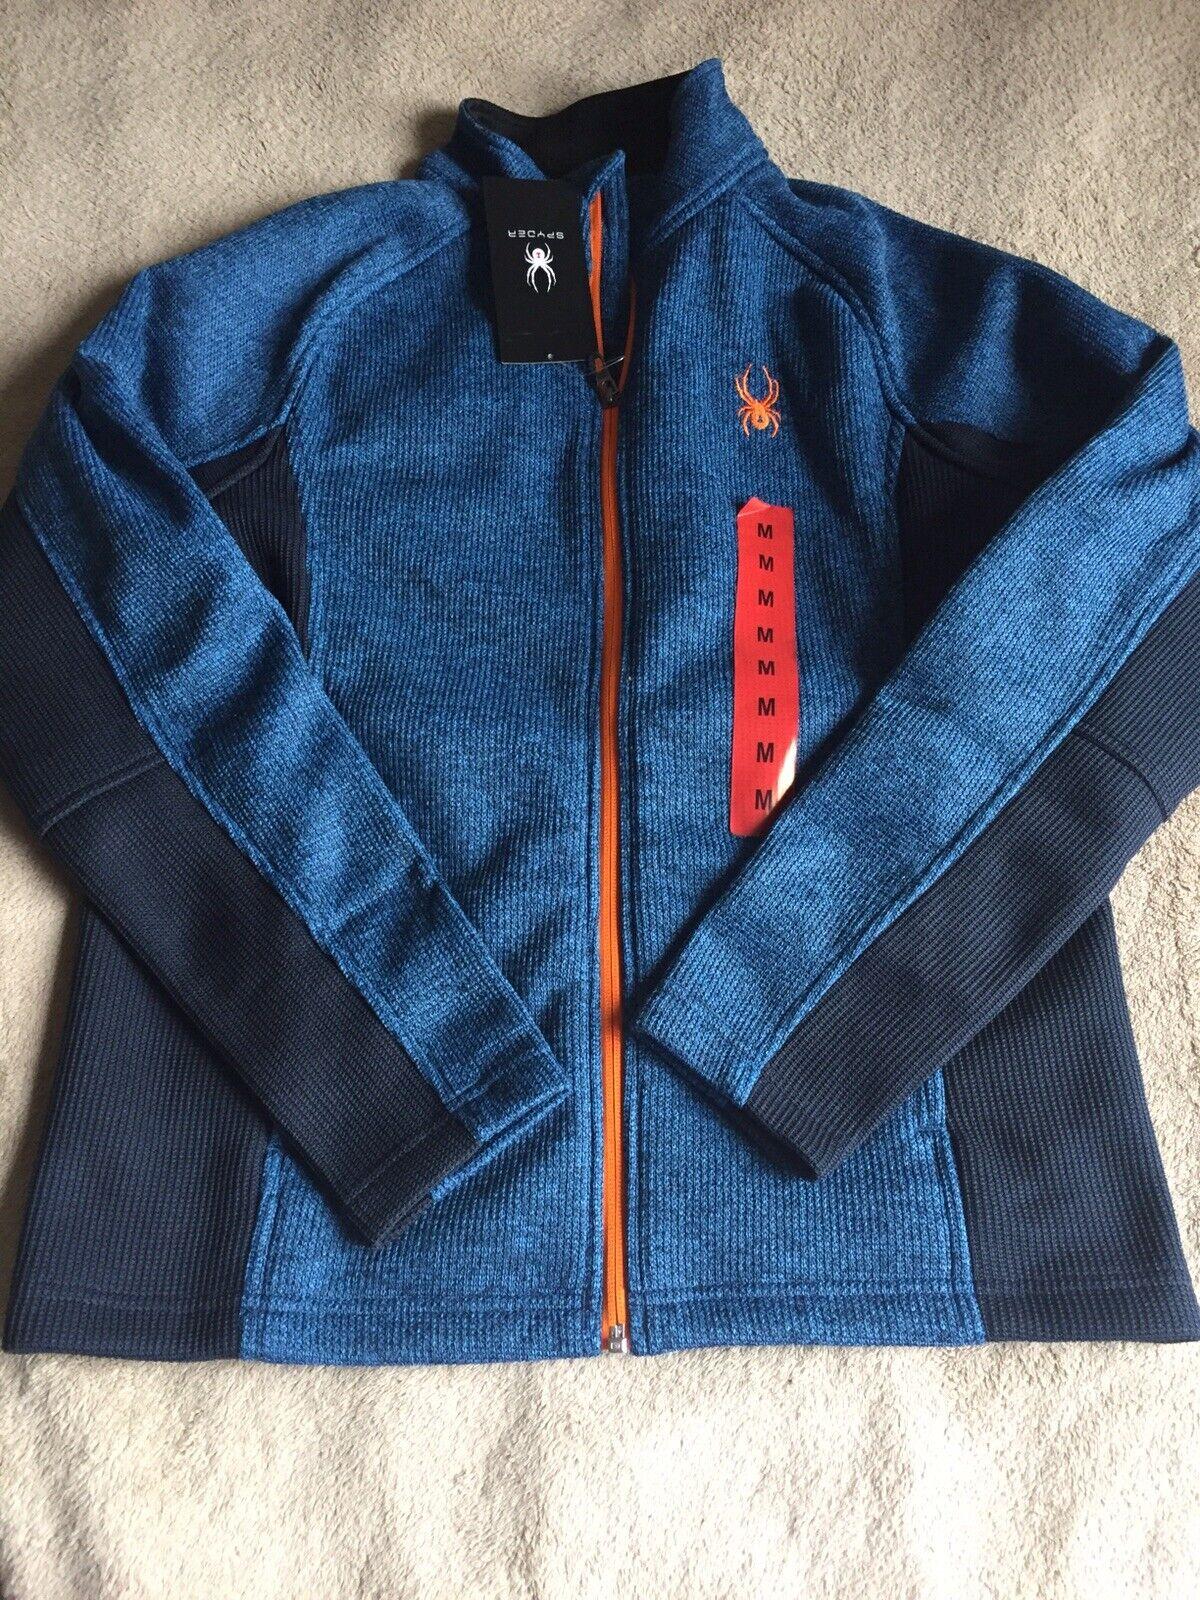 New Spyder Men's Constant Full Zip Sweater (402 FRO FRB. M)